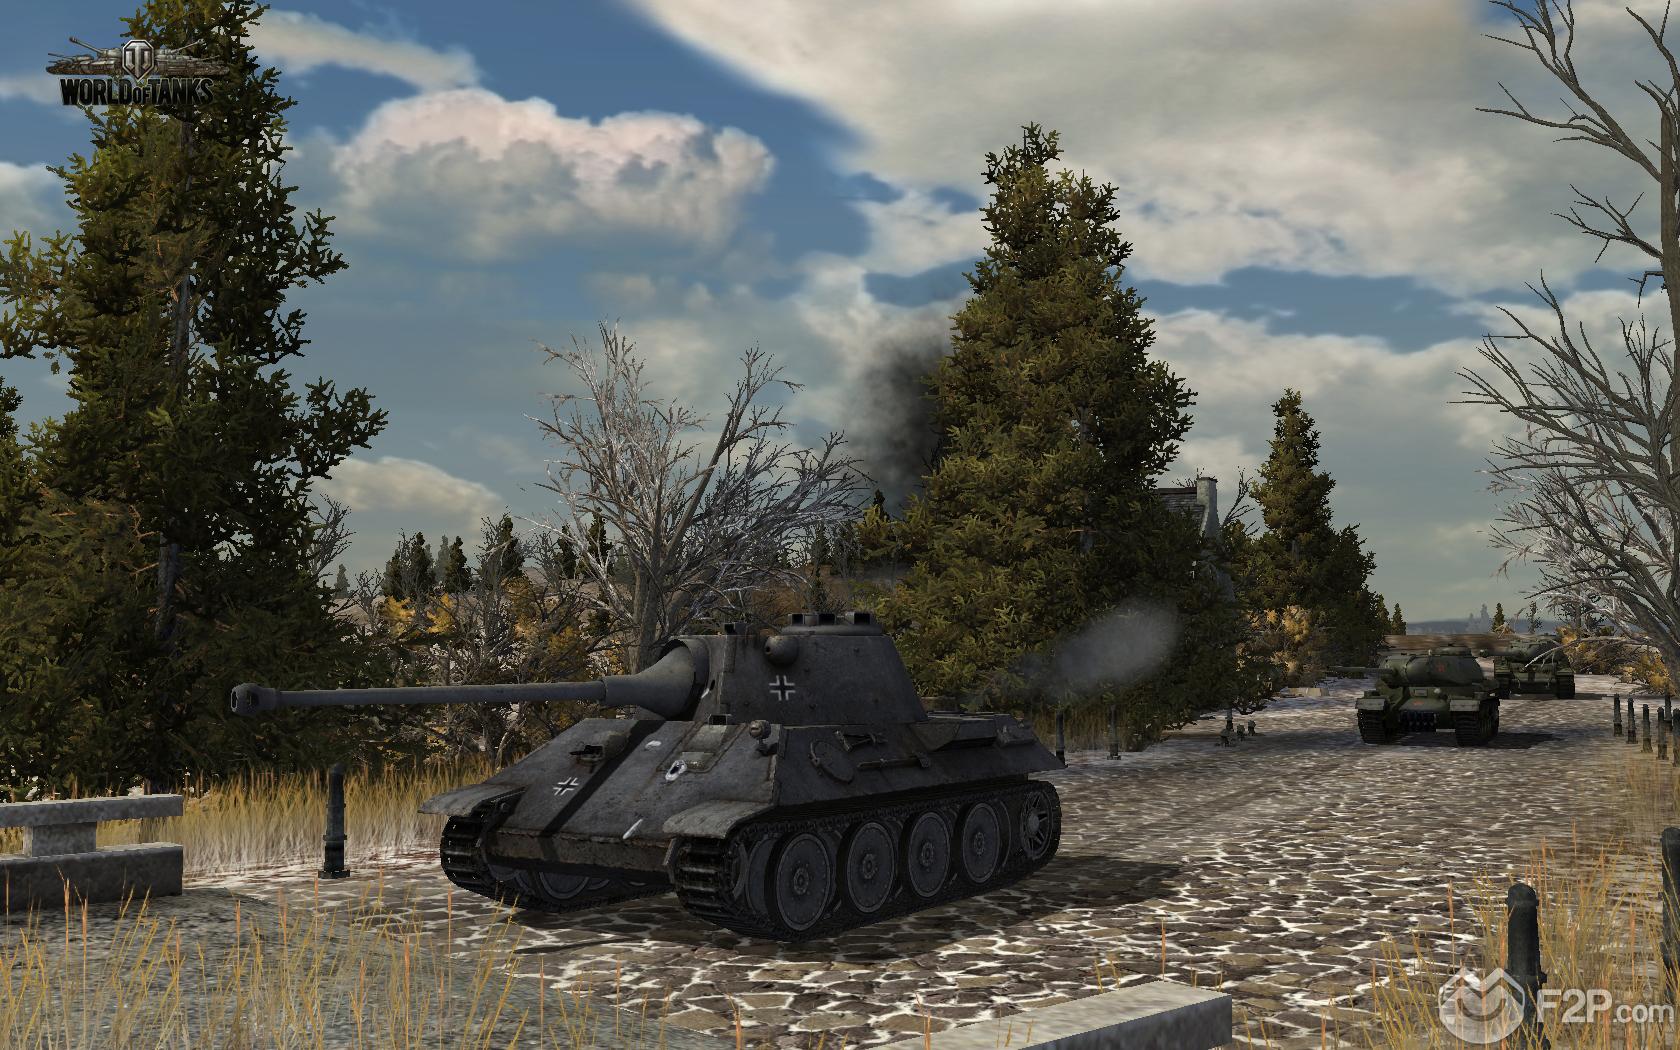 Click image for larger version.Name:World of Tanks 67.jpgViews:127Size:1.51 MBID:3842